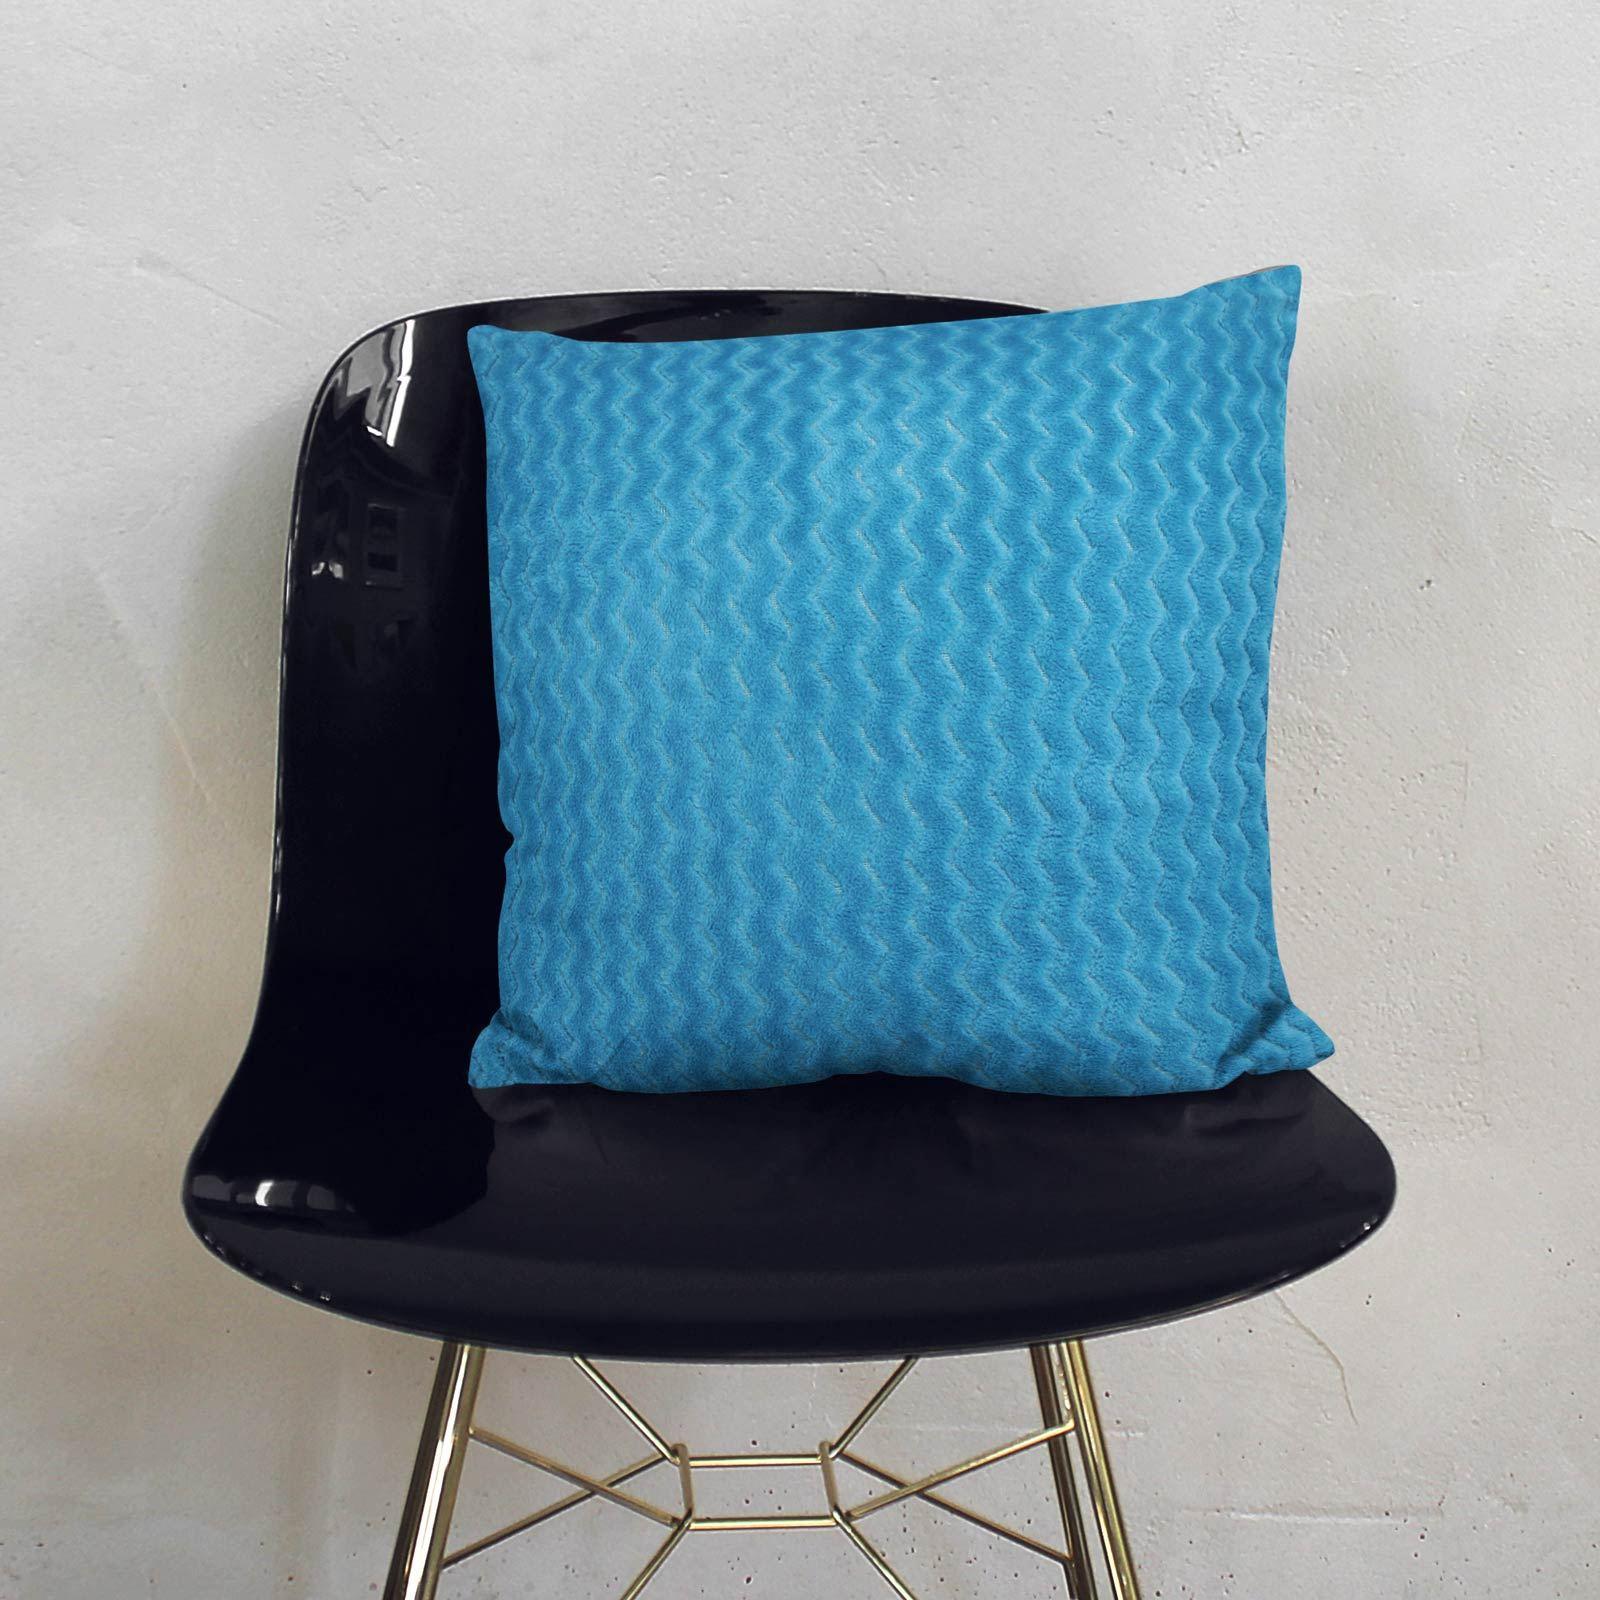 Teal-Blue-Duck-Egg-Cushion-Covers-18-034-x18-034-45cm-x-45cm-Luxury-Cover thumbnail 37